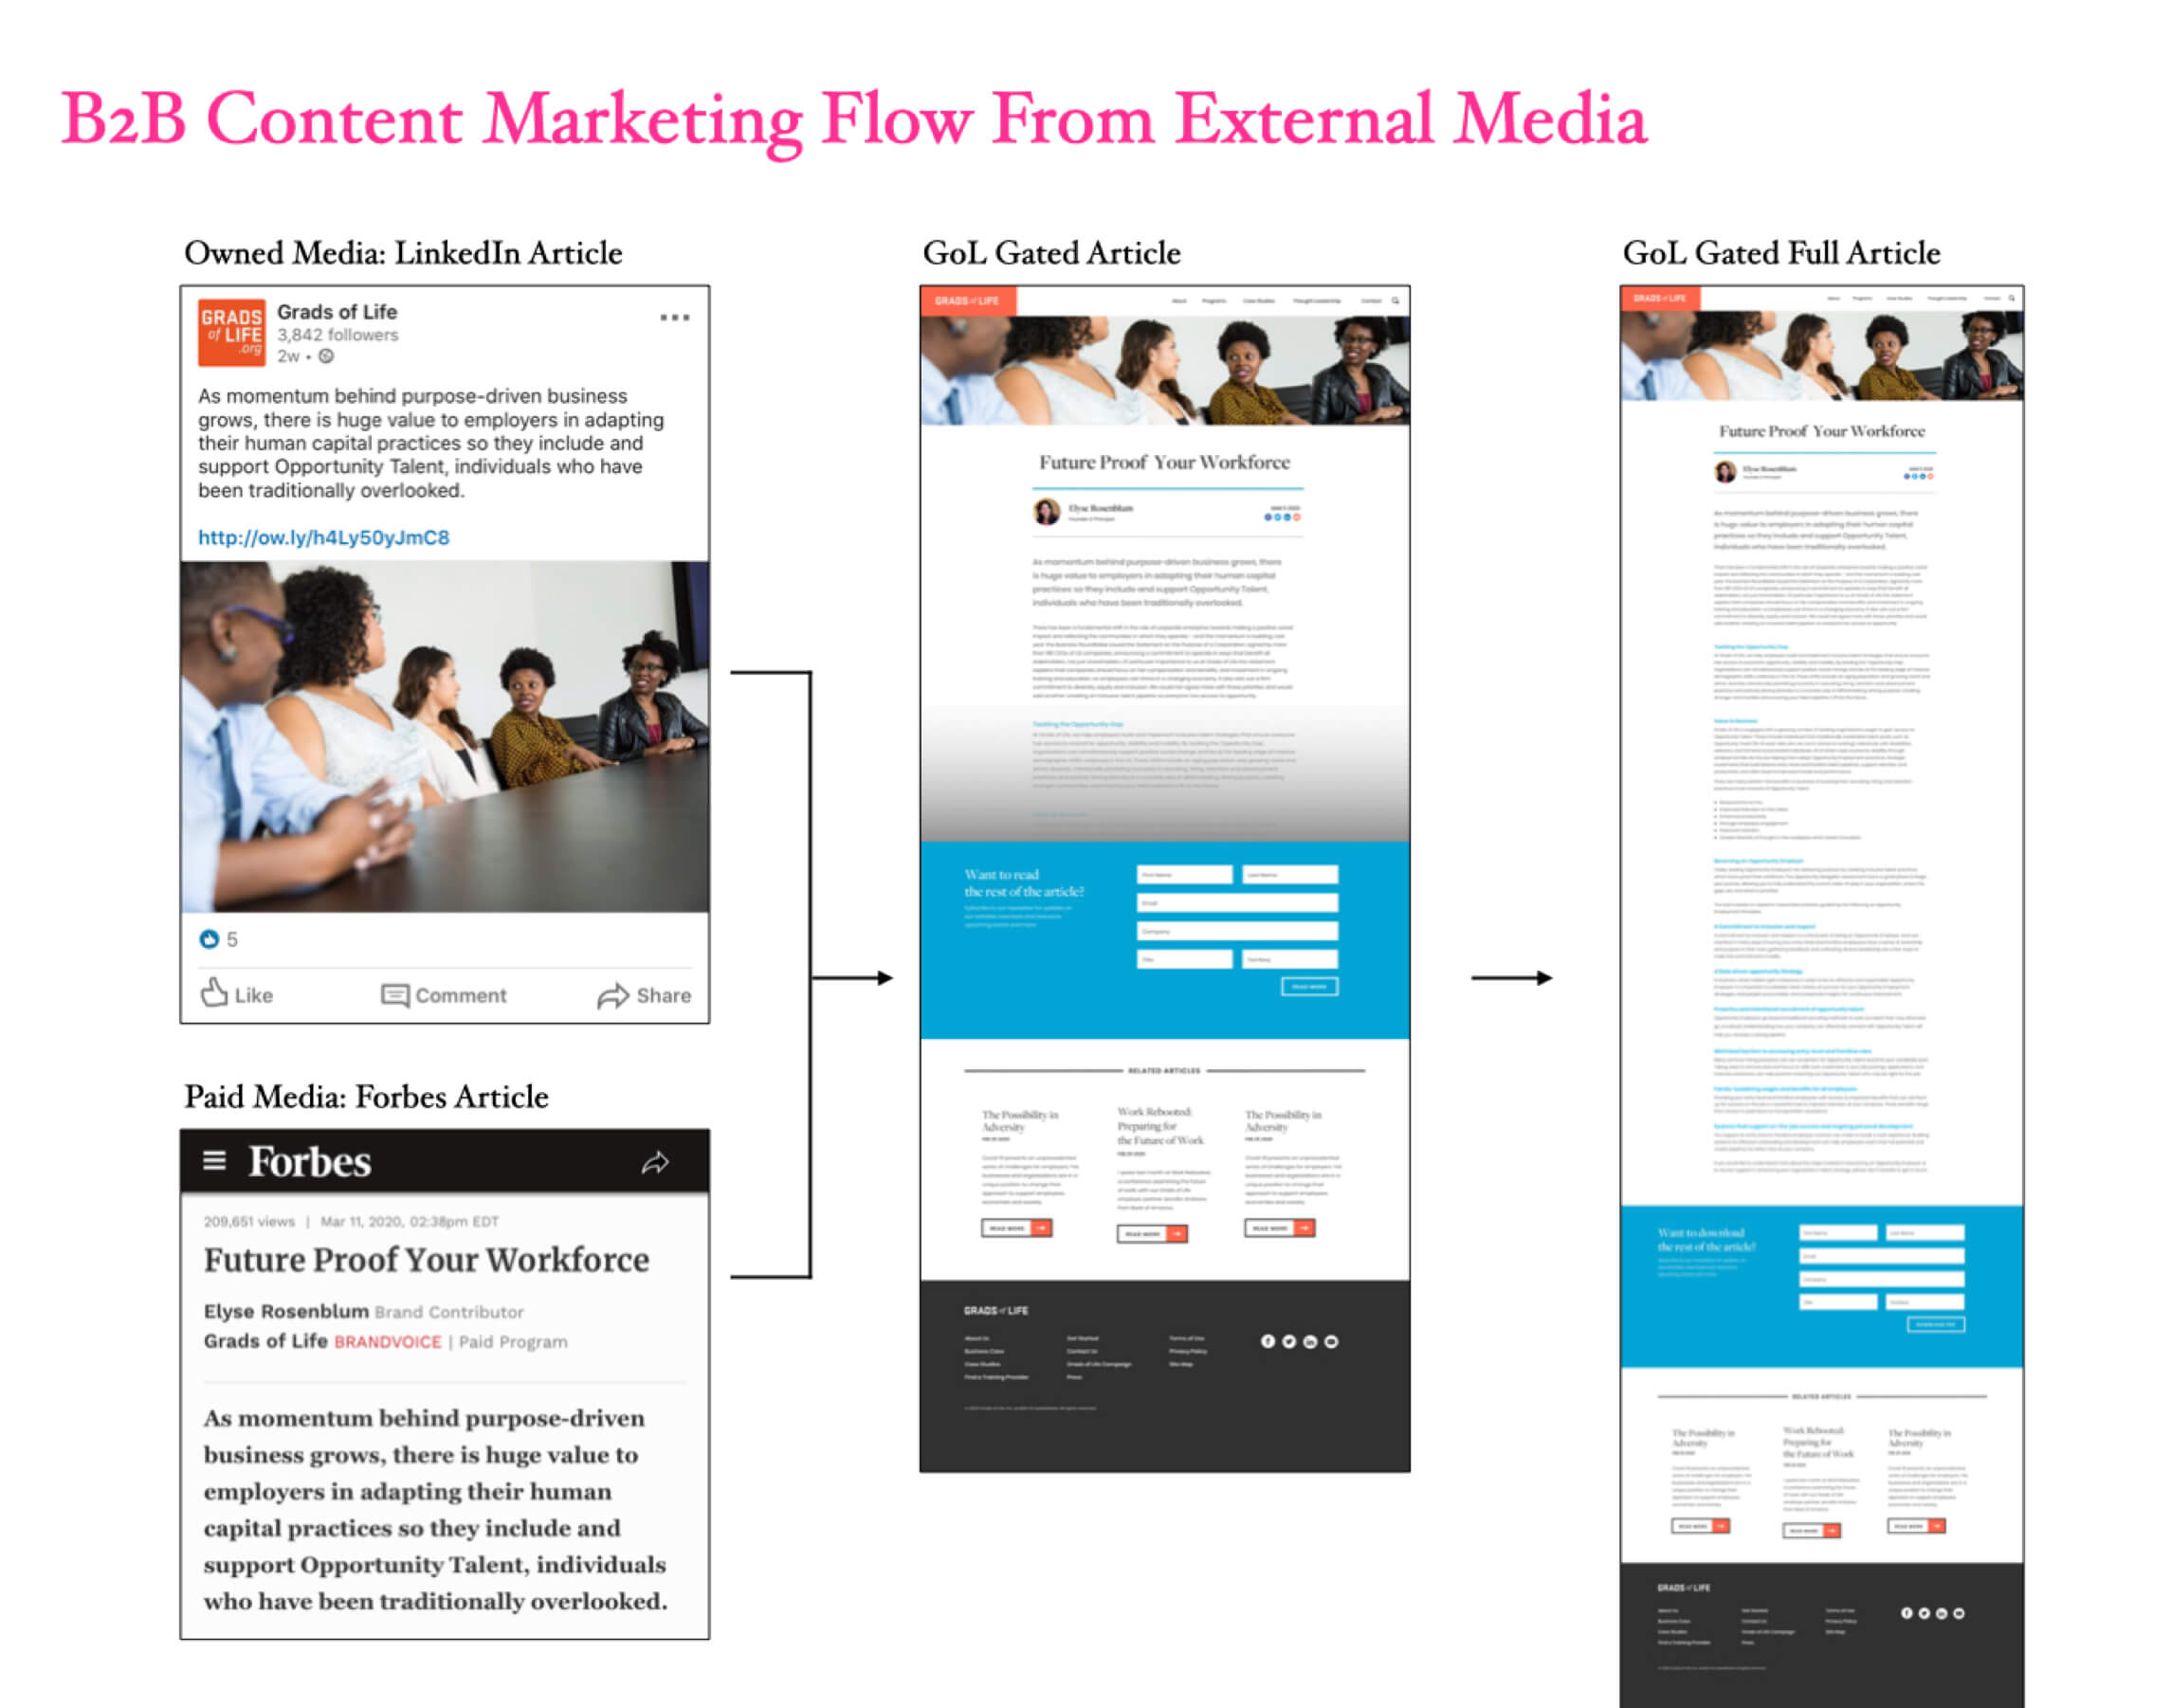 Grads of Life B2B Content Marketing Flow